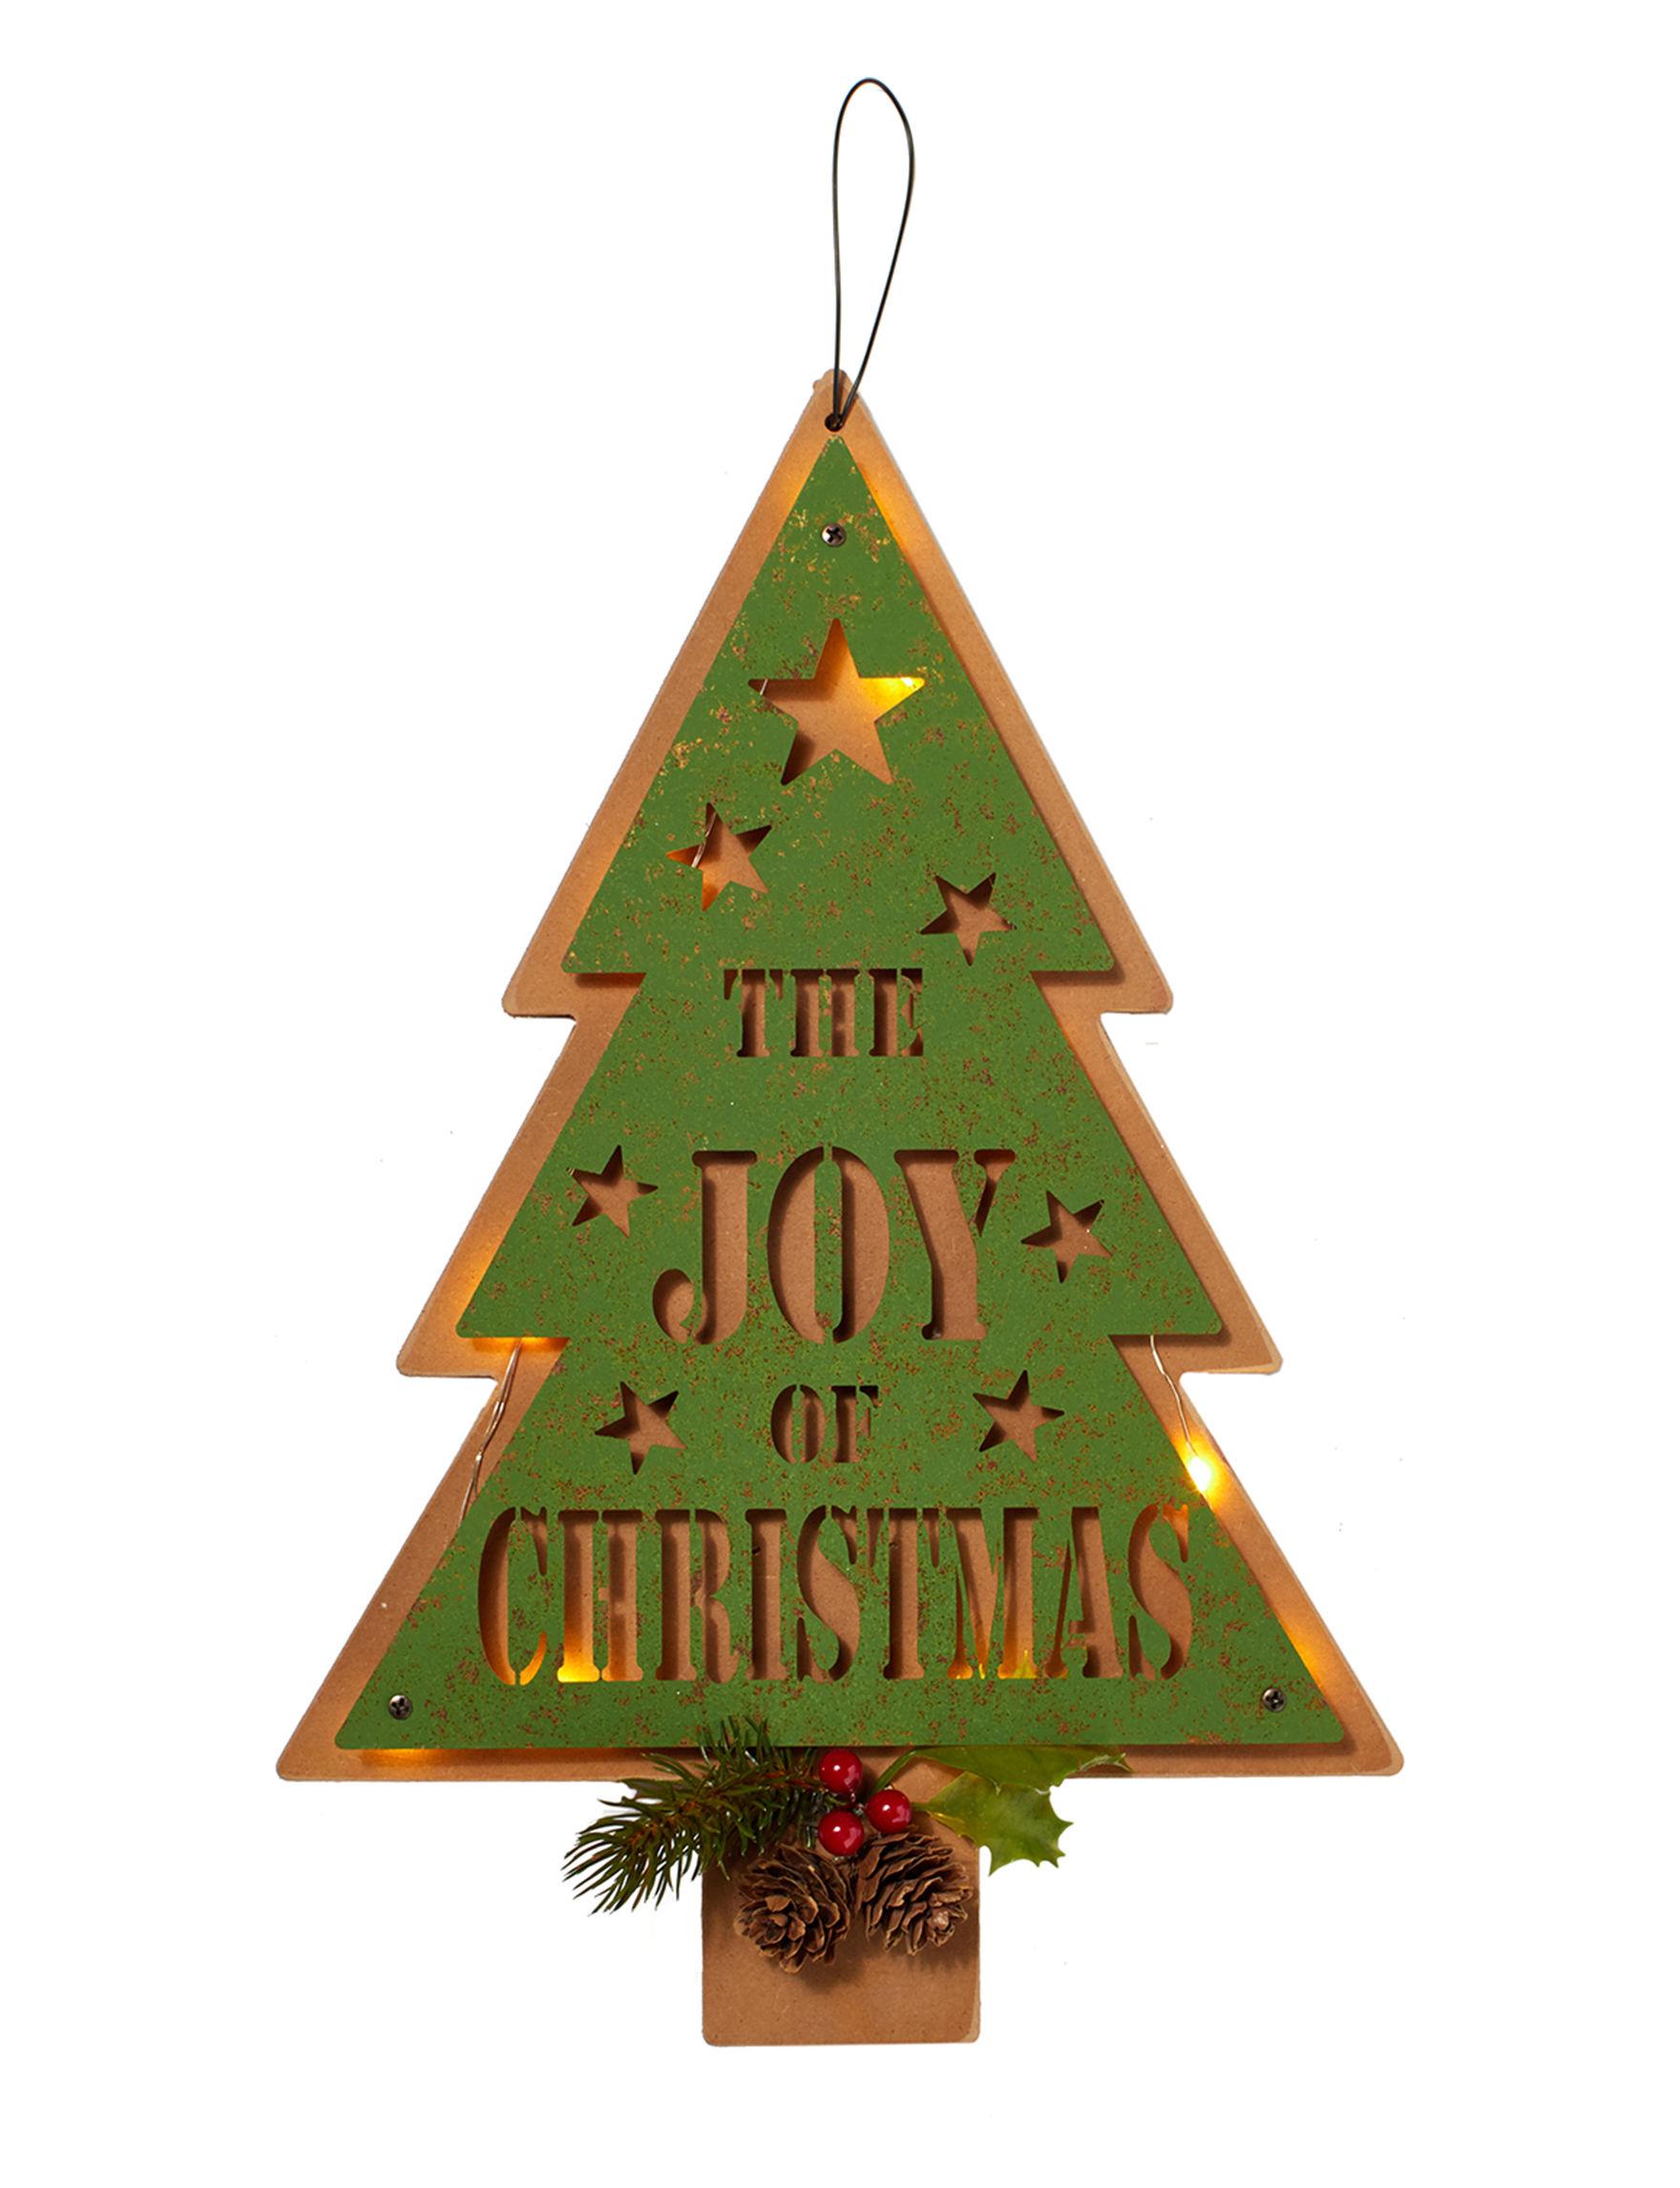 Jingle Bell Lane Green Holiday Decor Wall Decor